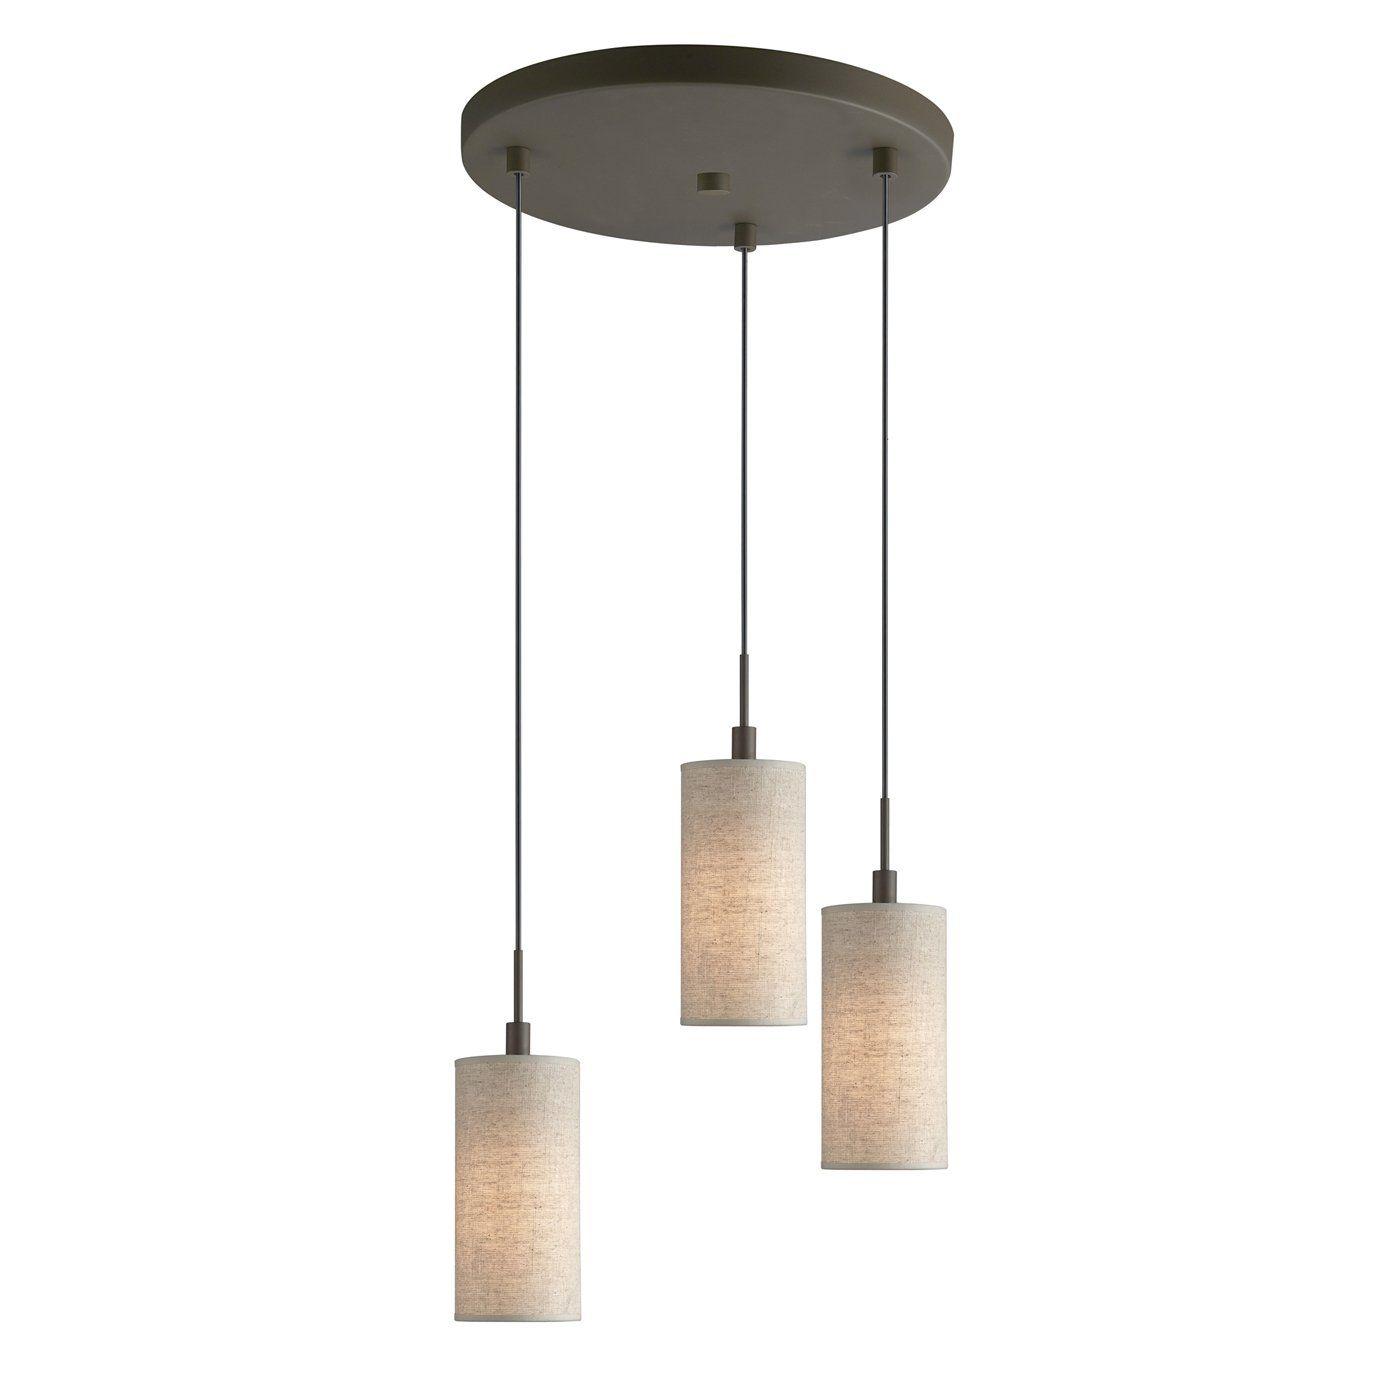 Multi Pendant Lighting Kitchen Cost Of Renovating A Woodbridge 13424 3 Light Fabric